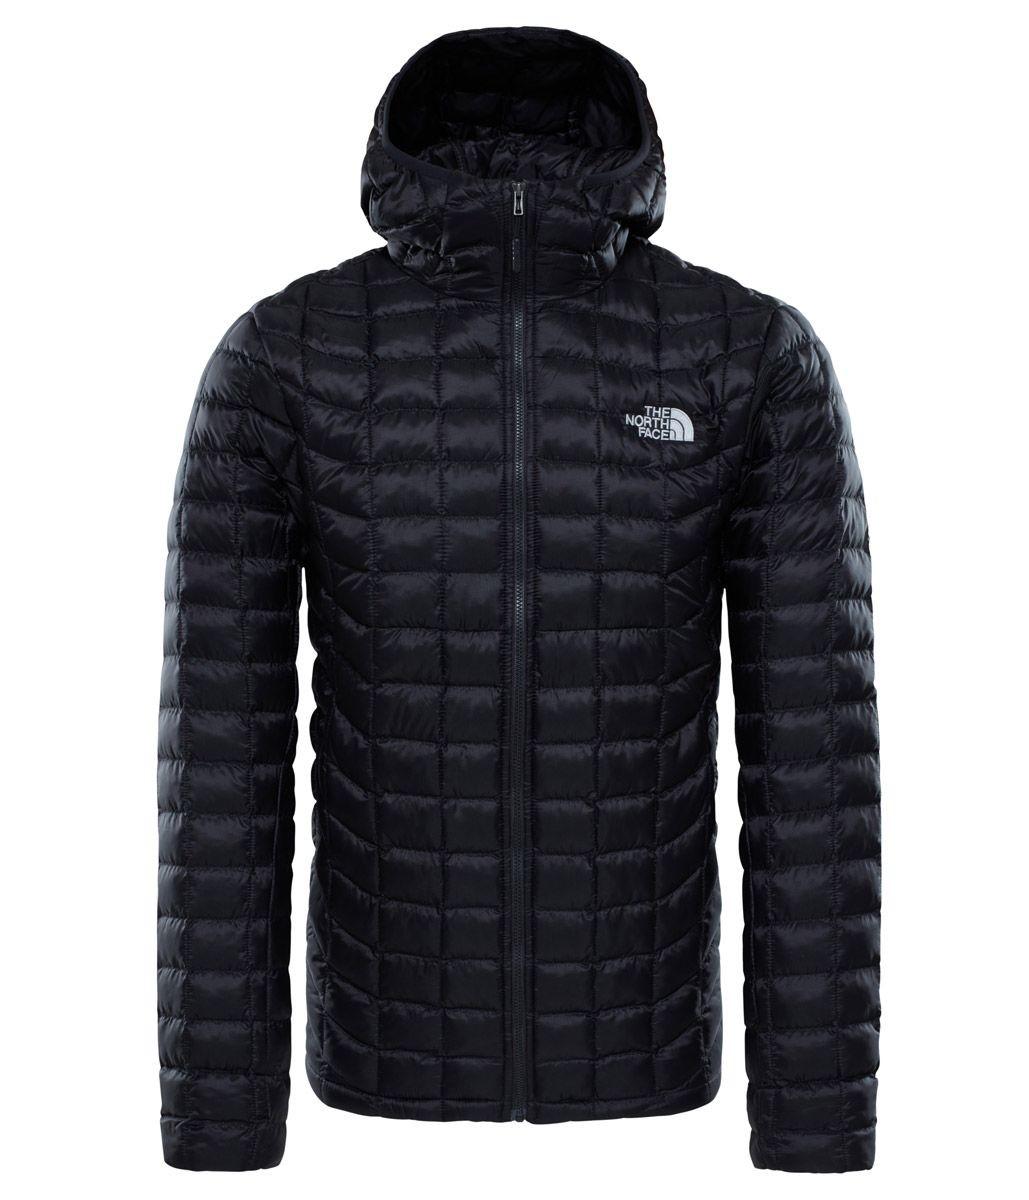 The North Face Thermoball Jacket. Fibra que imita la pluma